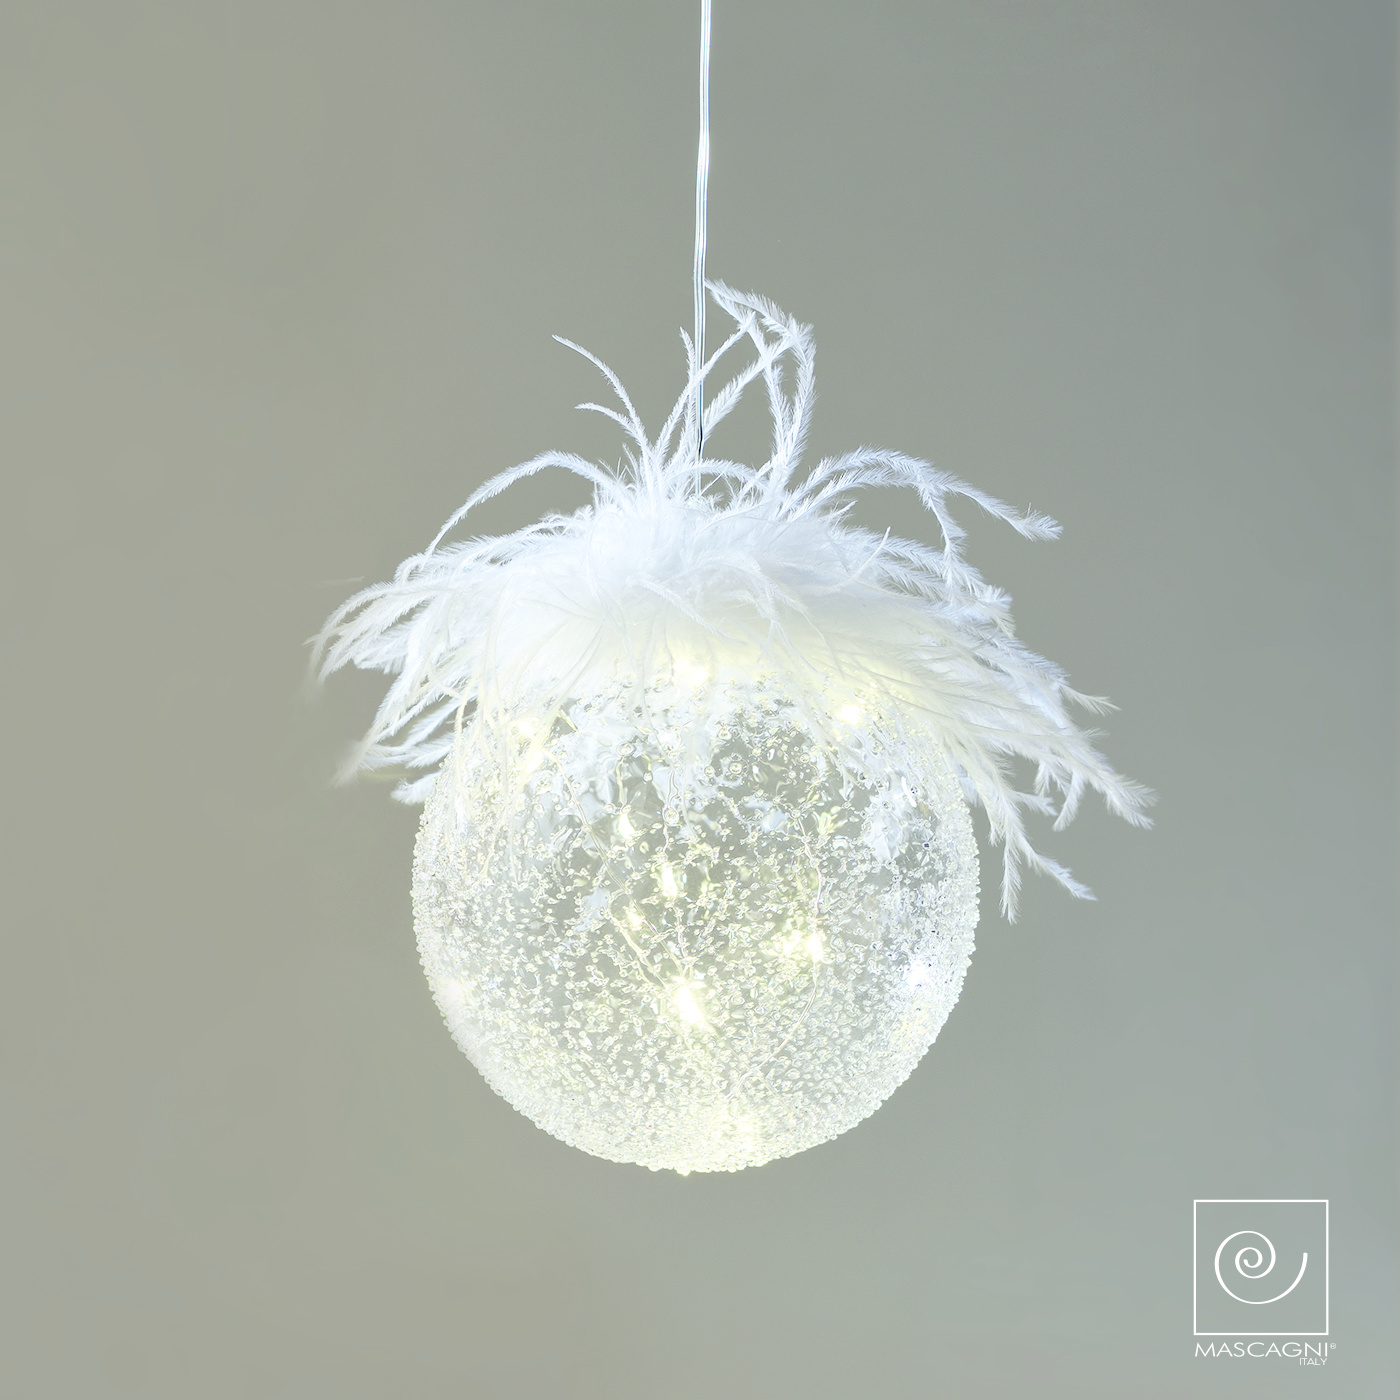 Art Mascagni LED BALL DIAM.15